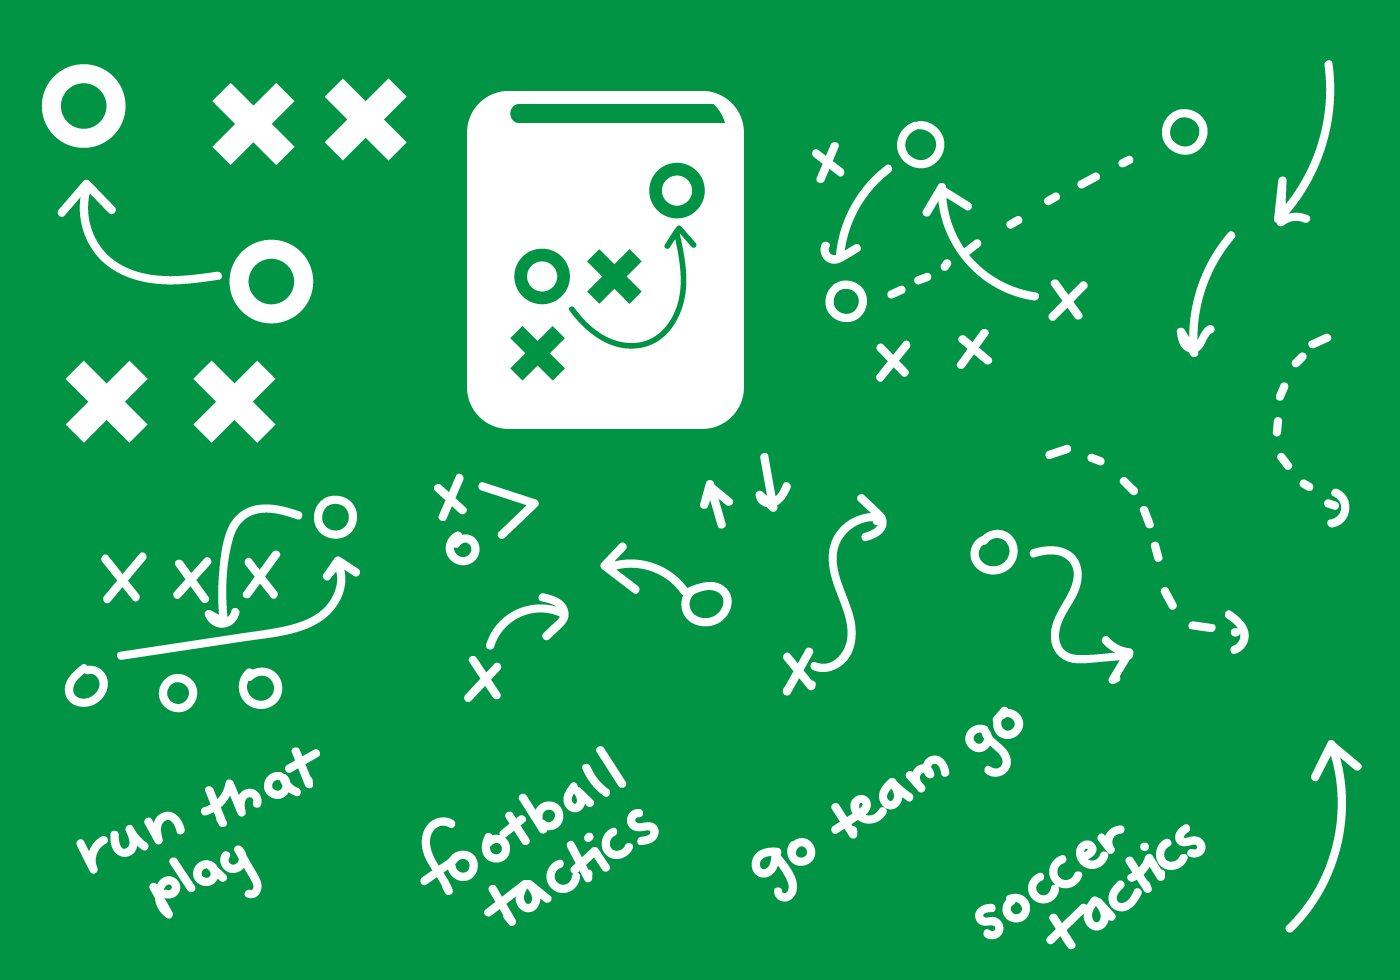 playbook graphics handdrawn plays